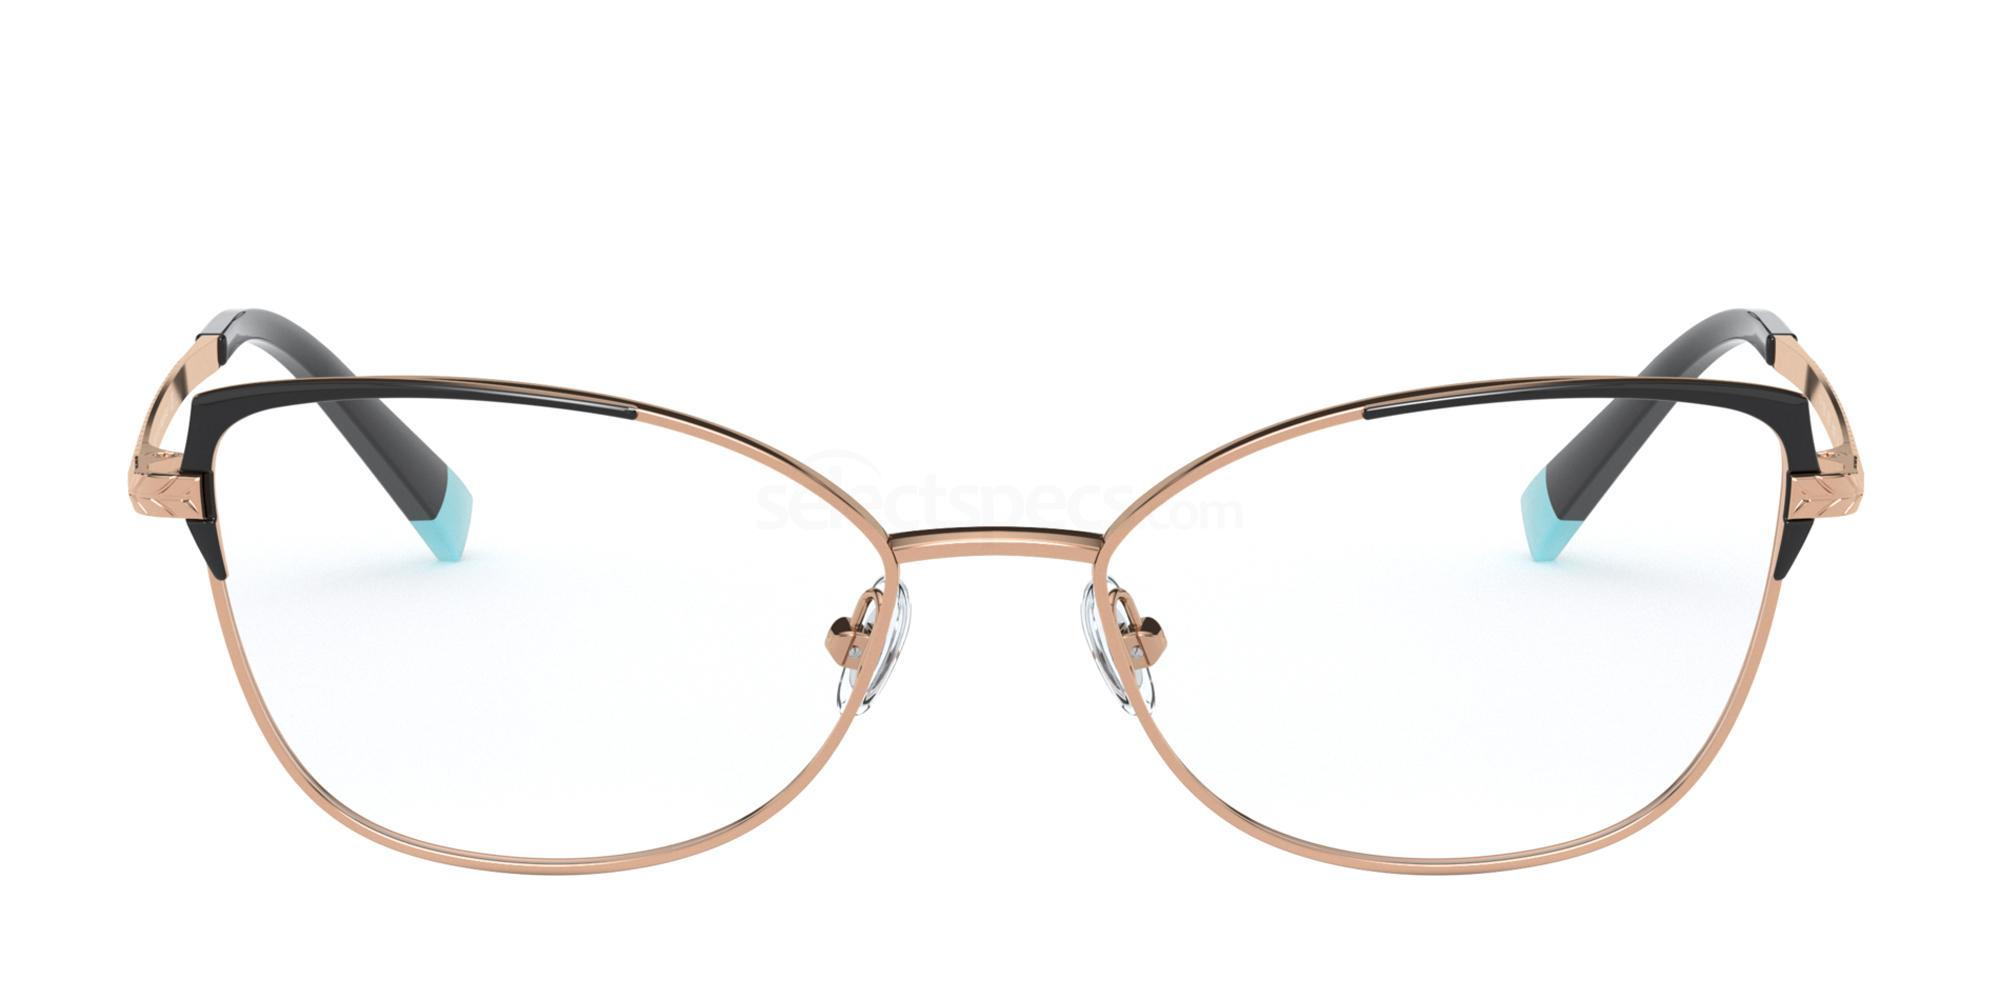 6007 TF1136 Glasses, Tiffany & Co.